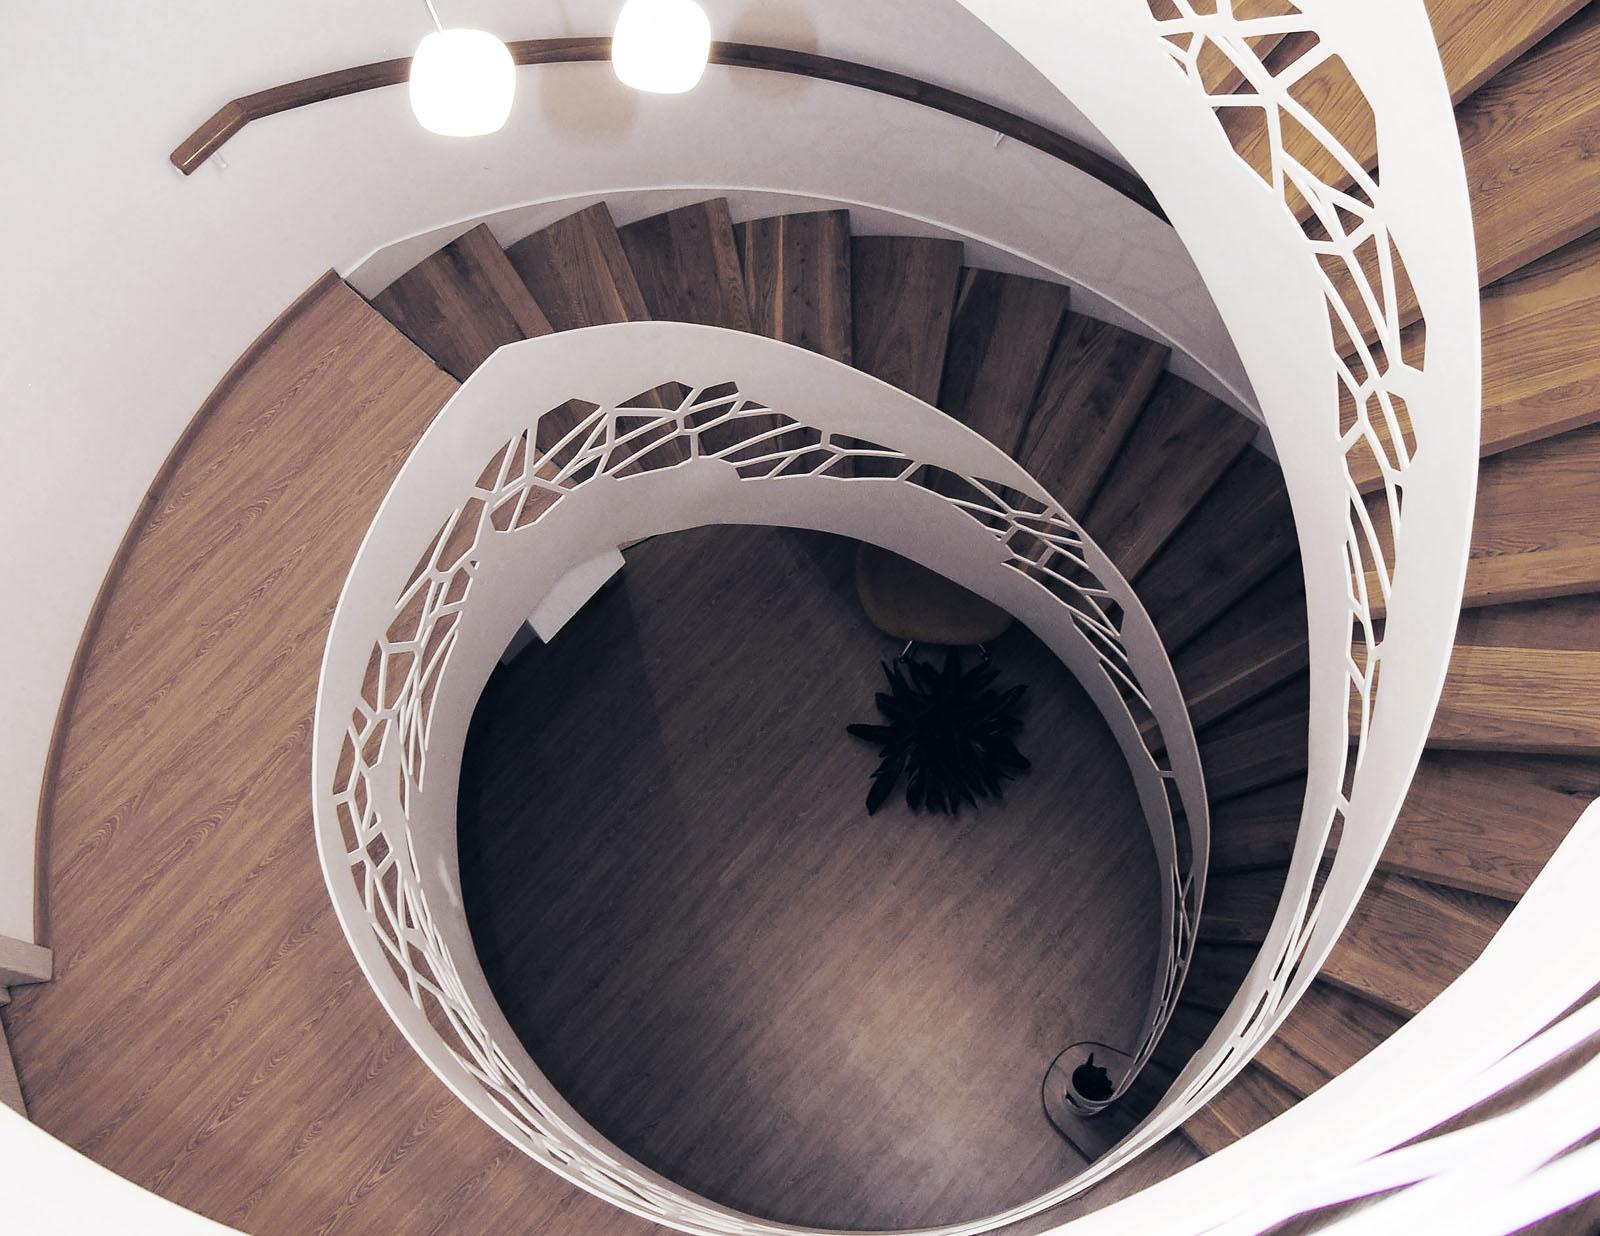 Scara elicoidala balustrada perforata trepte stejar haute couture